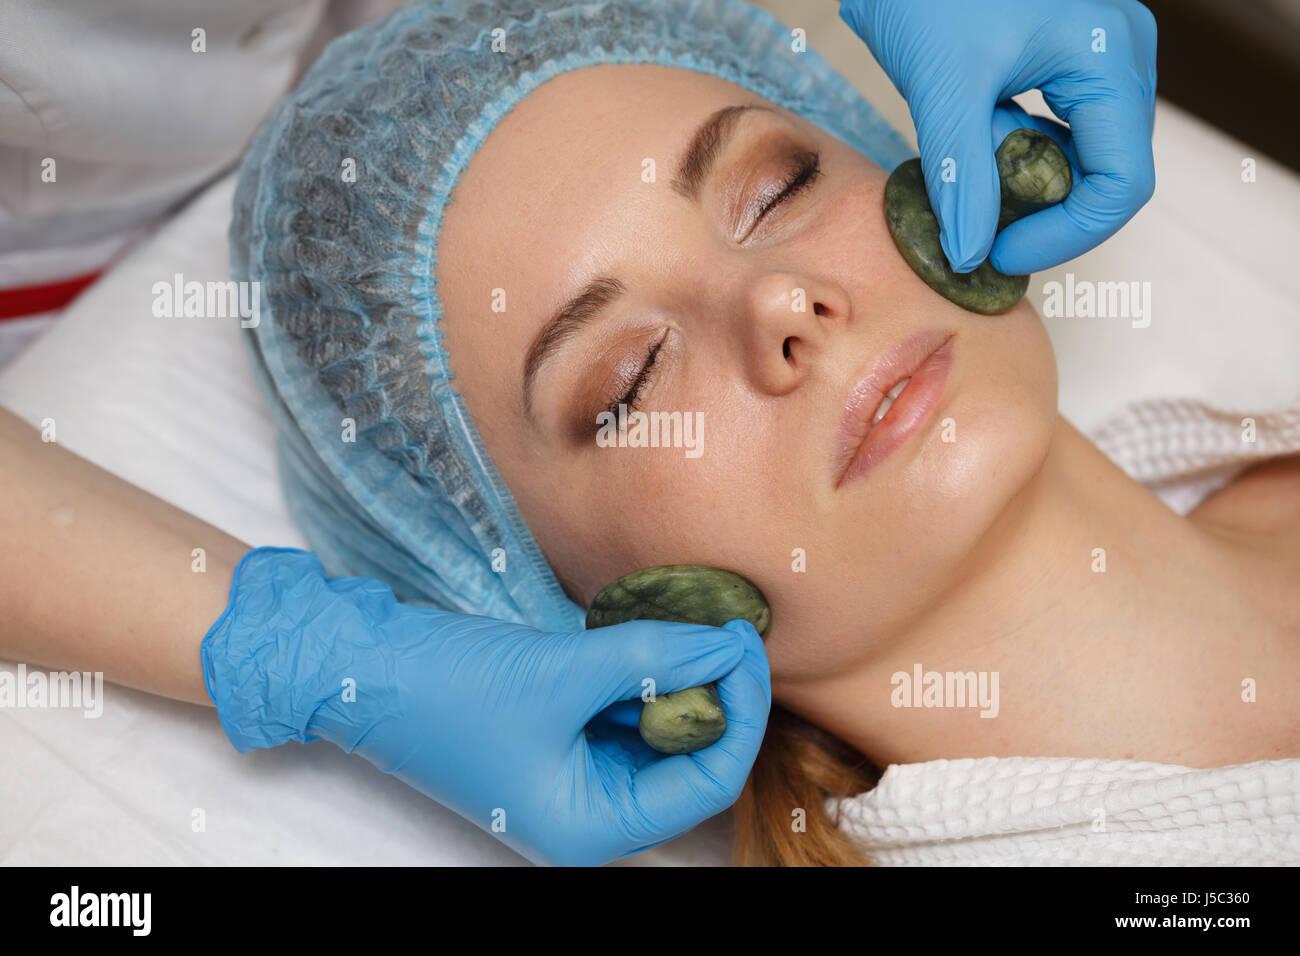 Beauty Salon Spa Anti Aging Facial Massage With Jade Stones Gua